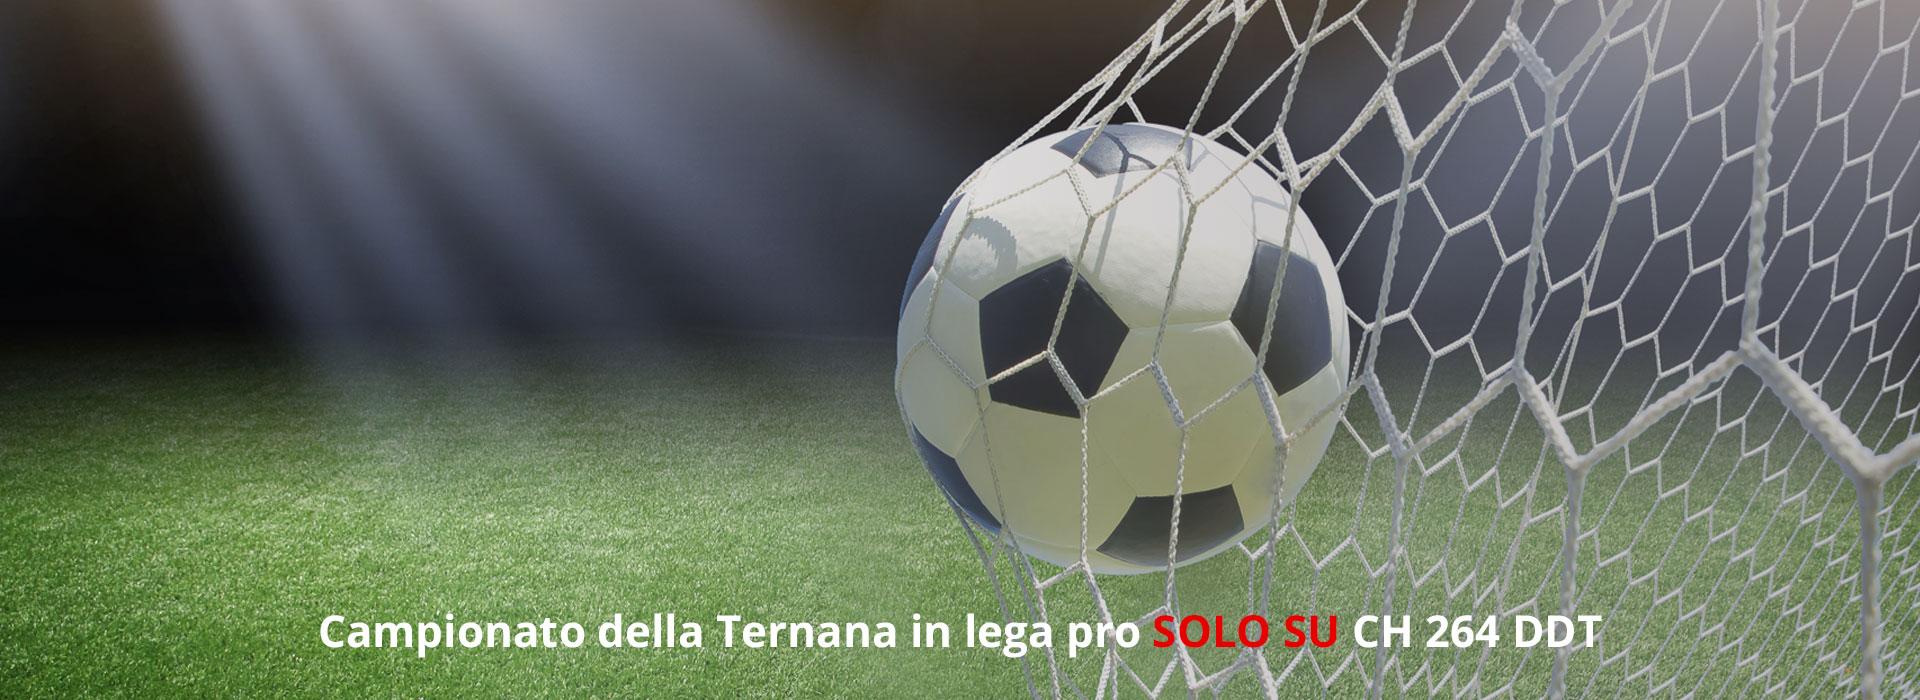 Serie C, la Ternana in diretta su Cusano Italia Tv (canale 264 DTT)